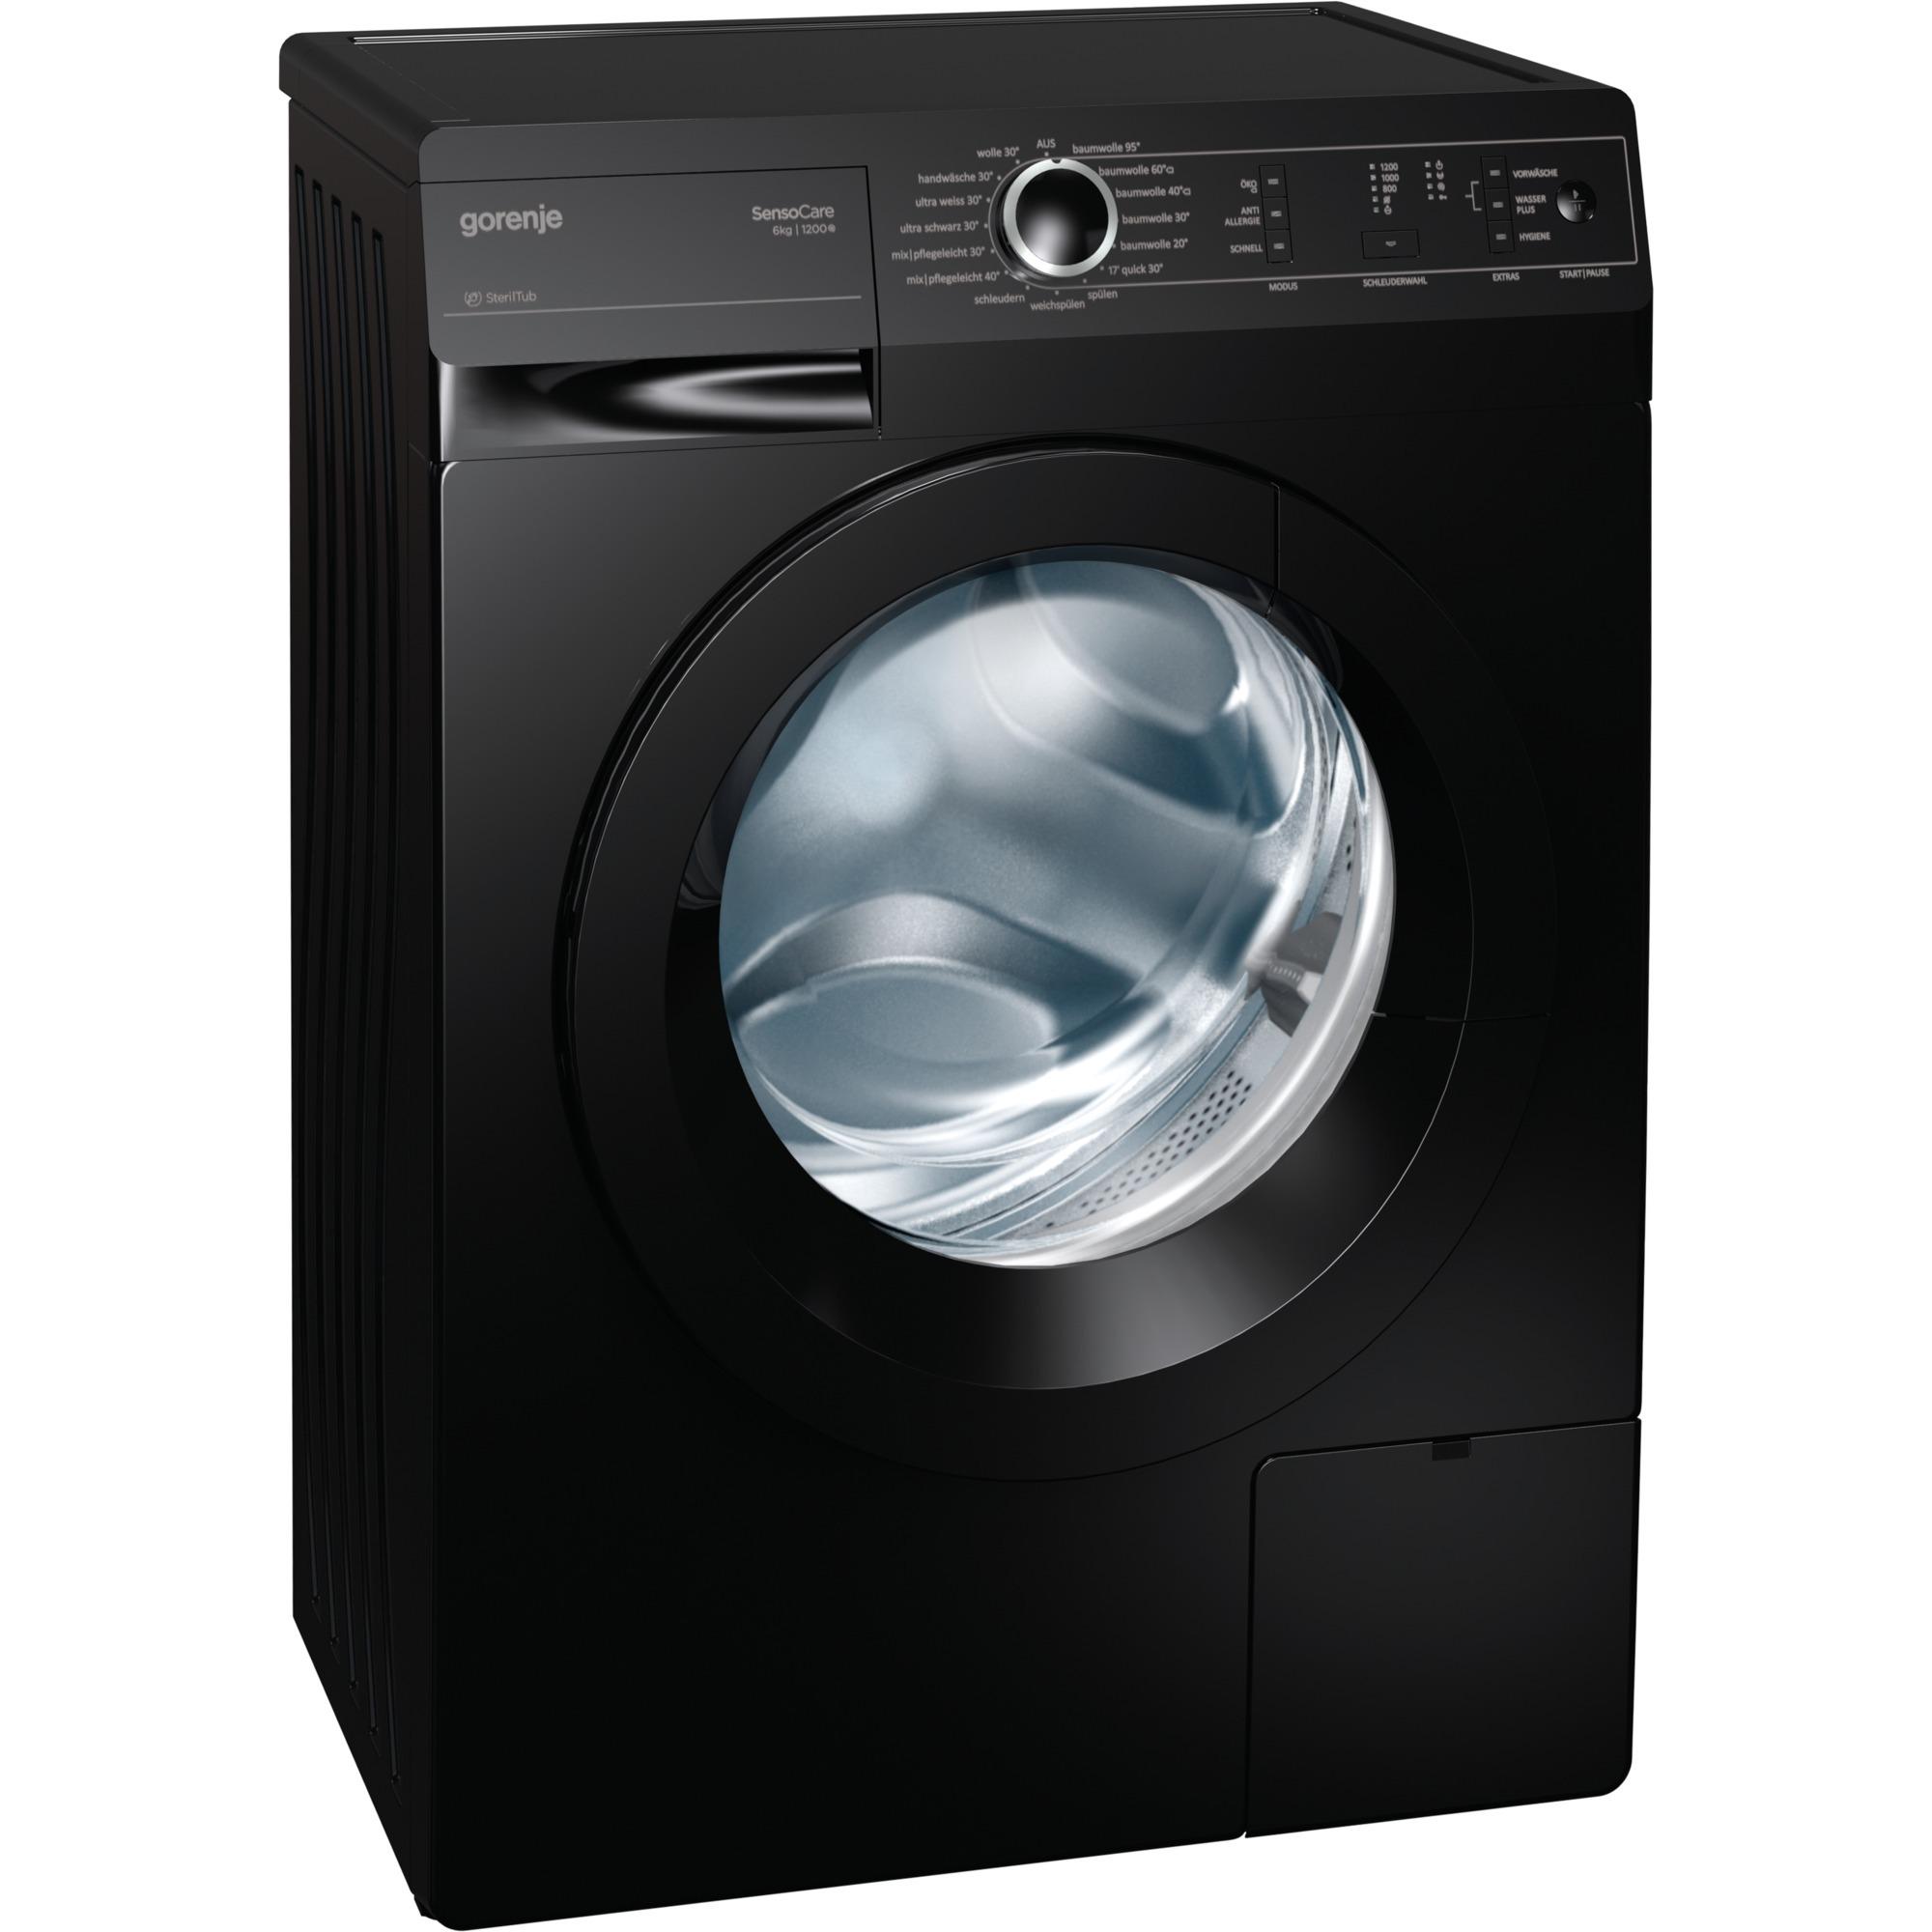 w6222pb s waschmaschine. Black Bedroom Furniture Sets. Home Design Ideas